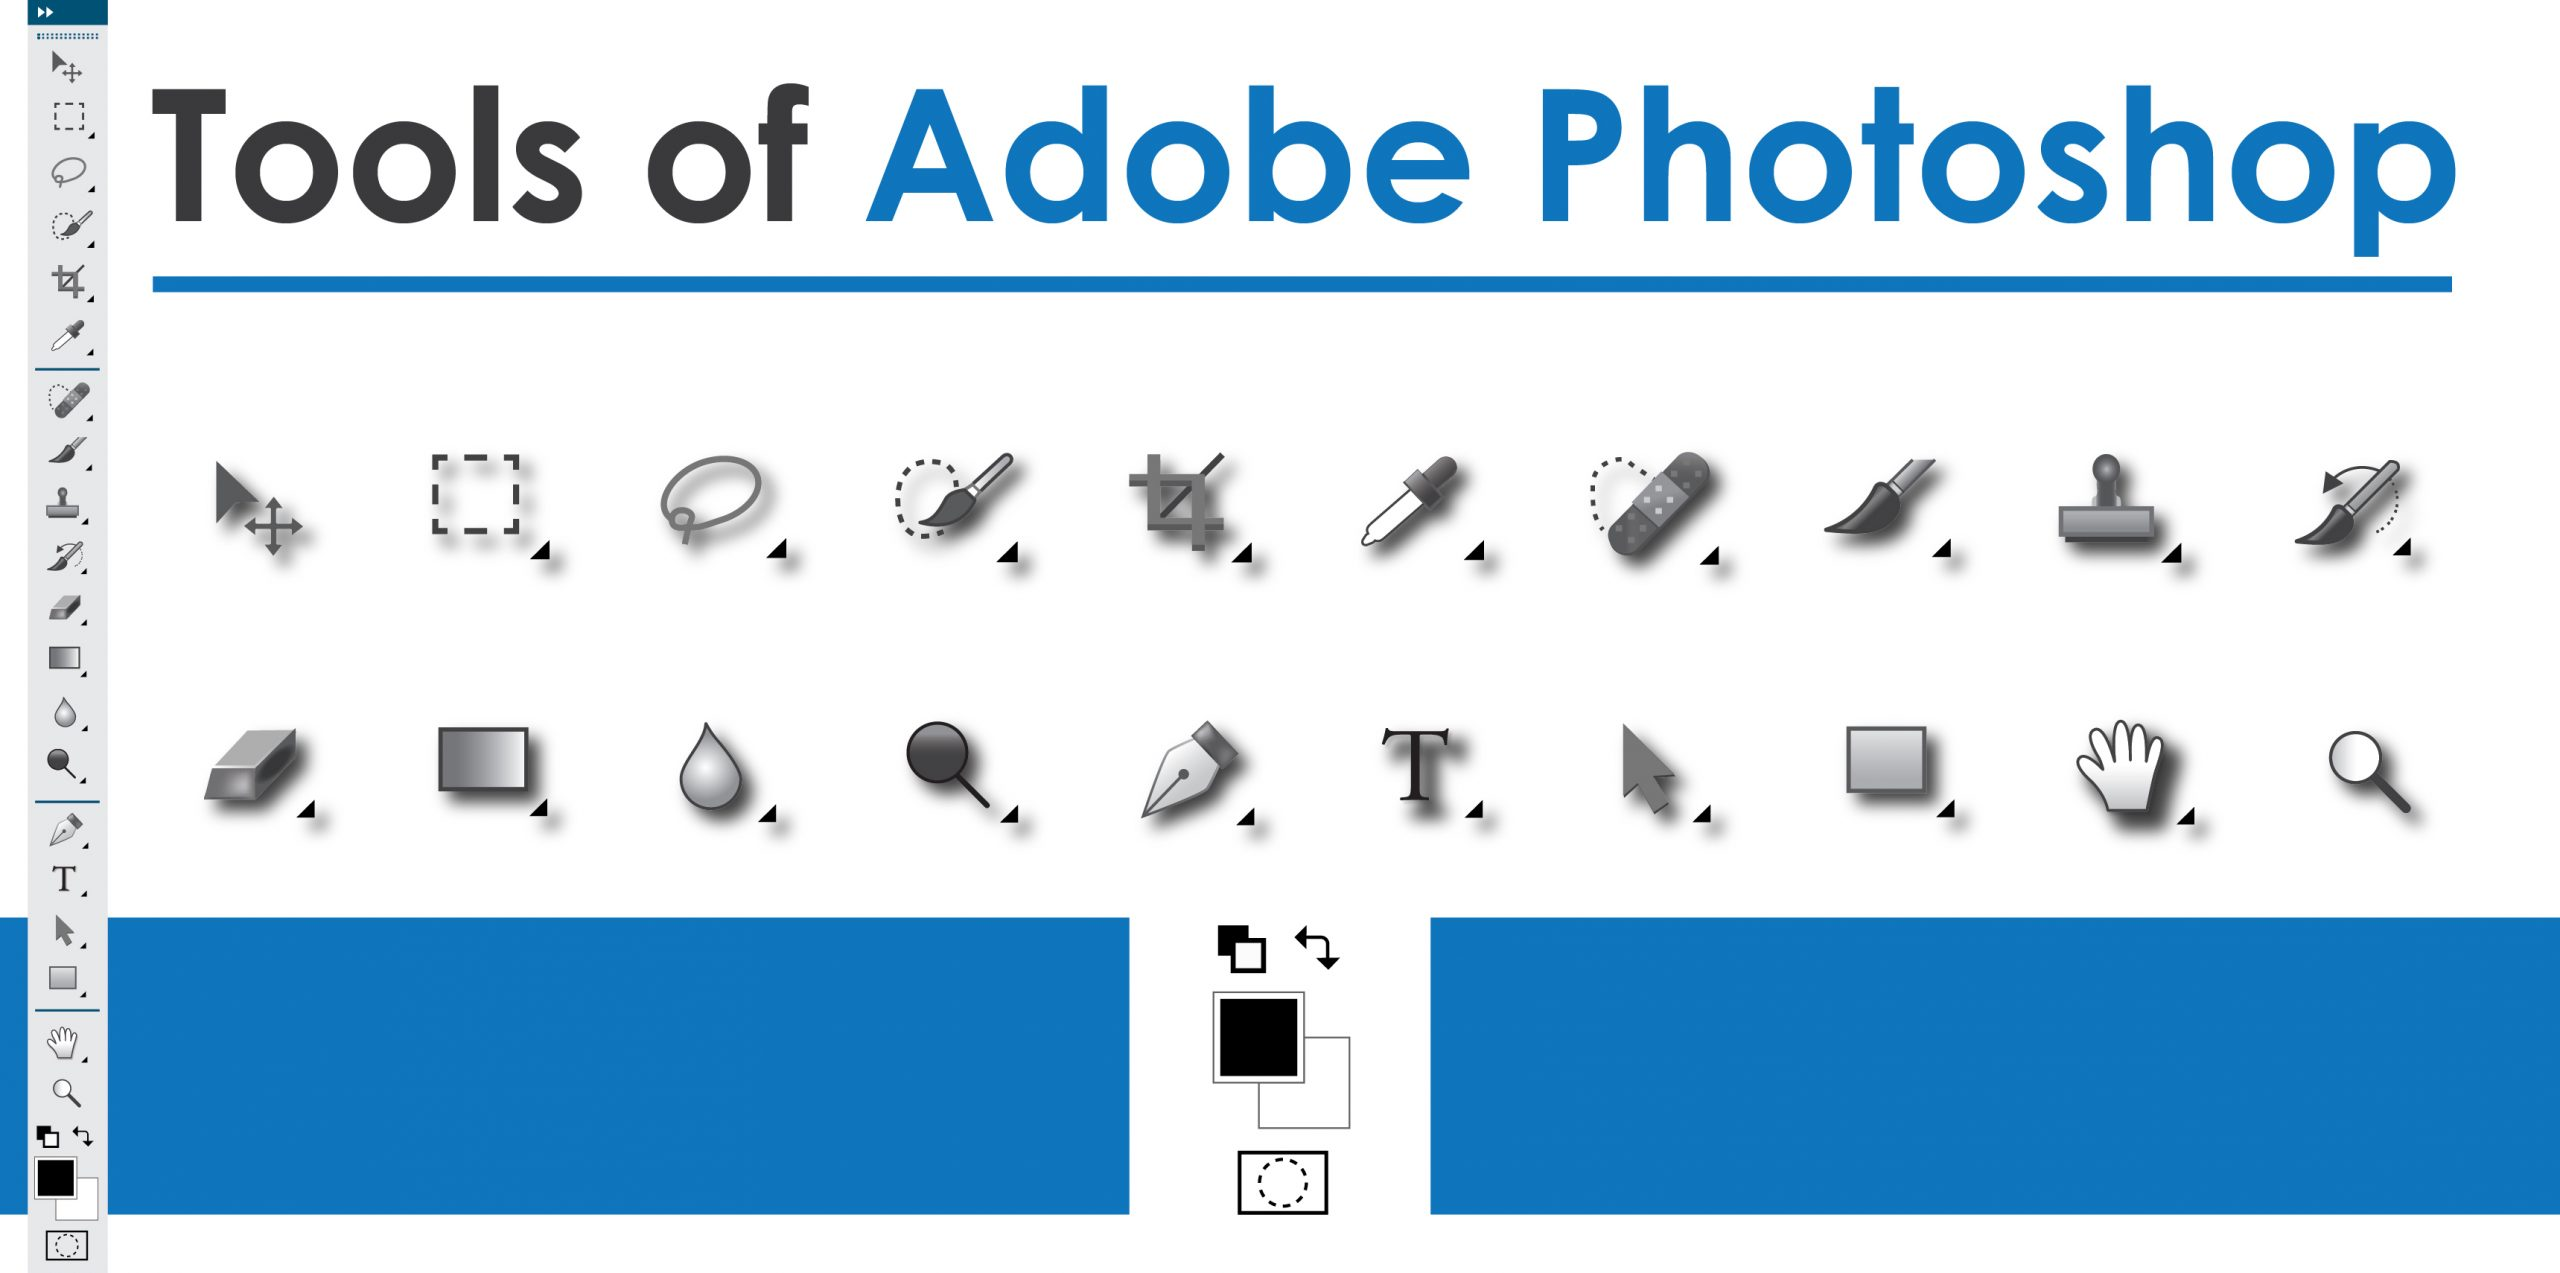 Tools of Adobe Photoshop